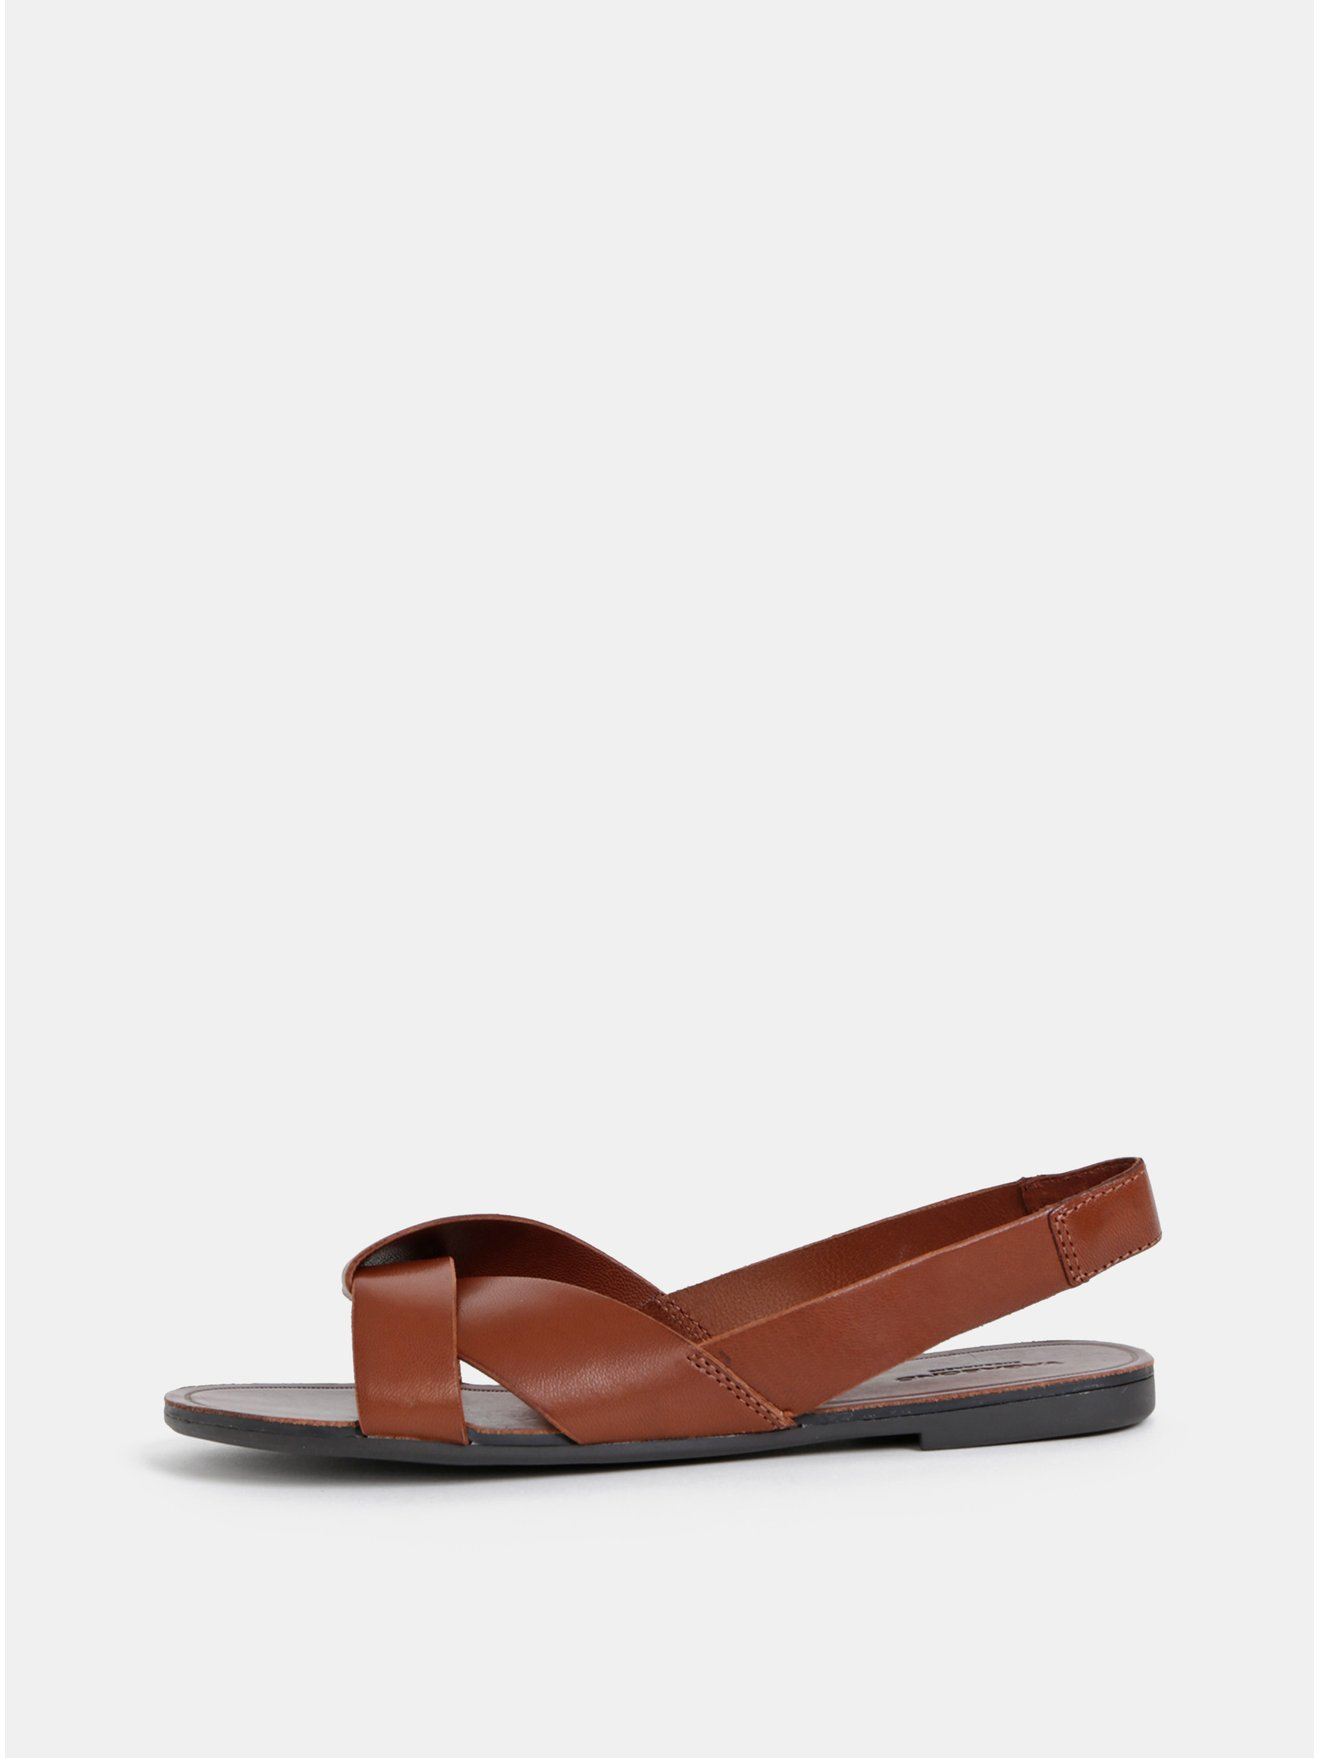 7b291ebead13 Hnědé dámské kožené sandály Vagabond Tia